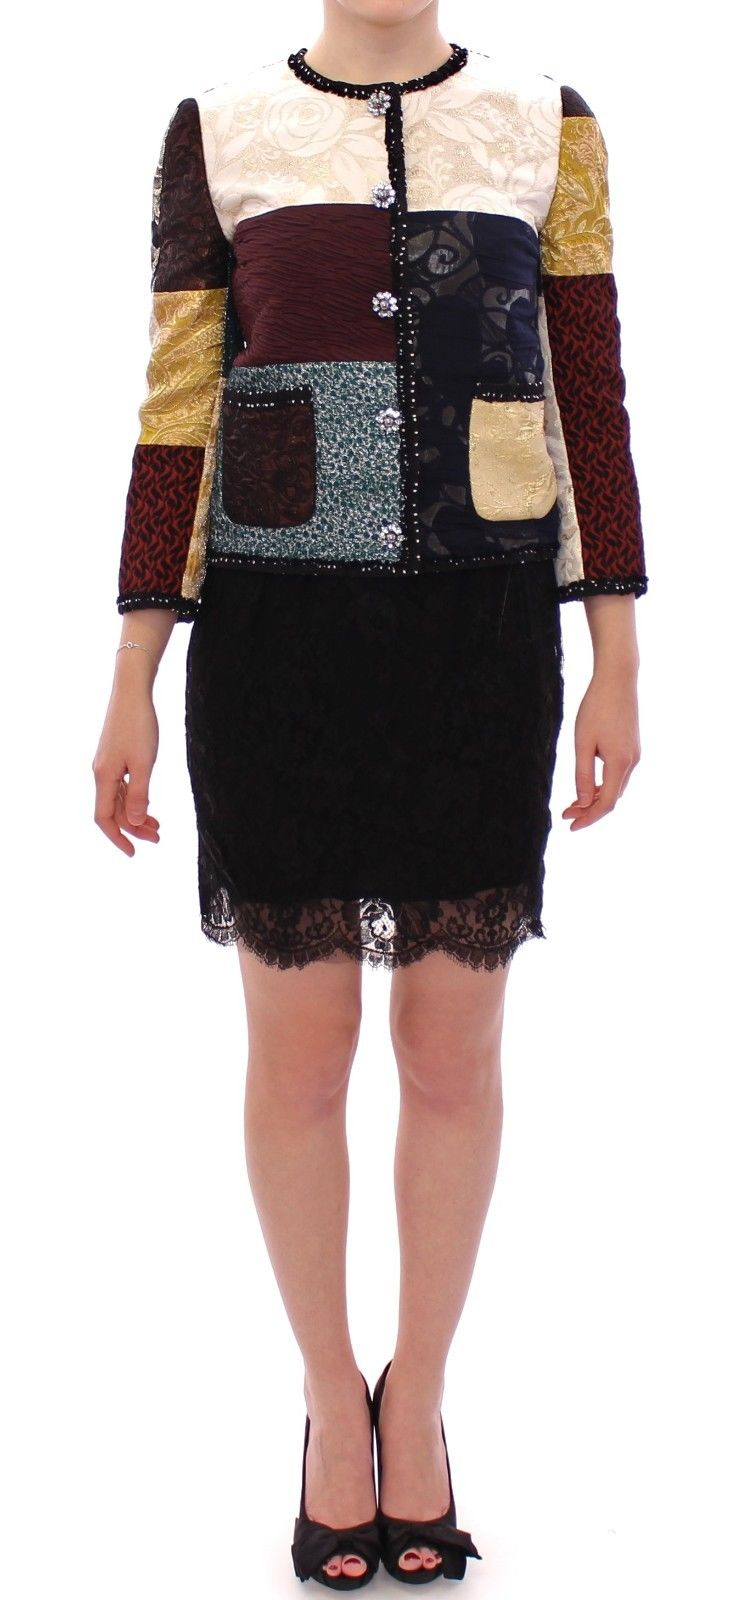 Dolce & Gabbana Women's Patchwork Baroque Crystal Jacket Coat Multicolor GSS11672 - IT38|XS